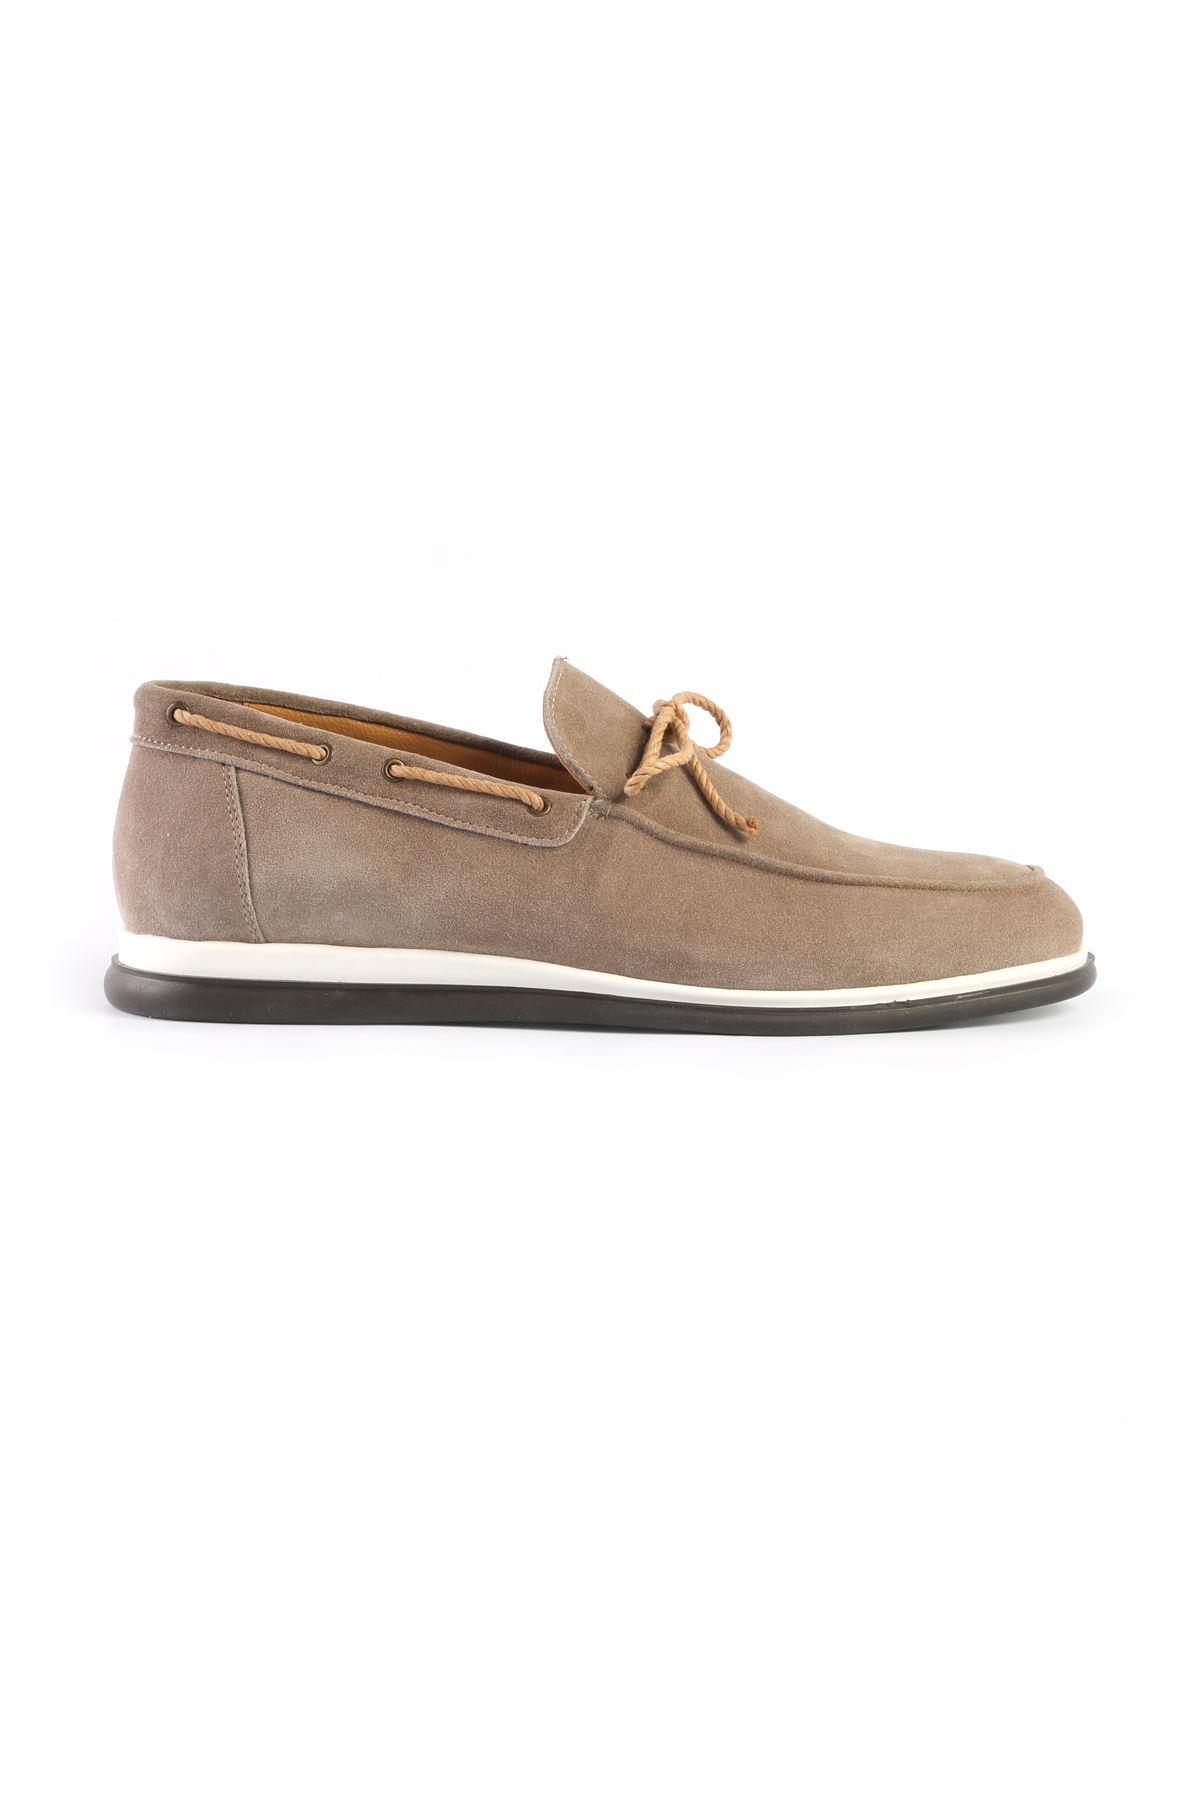 Libero 3283 Mink Loafer Shoes